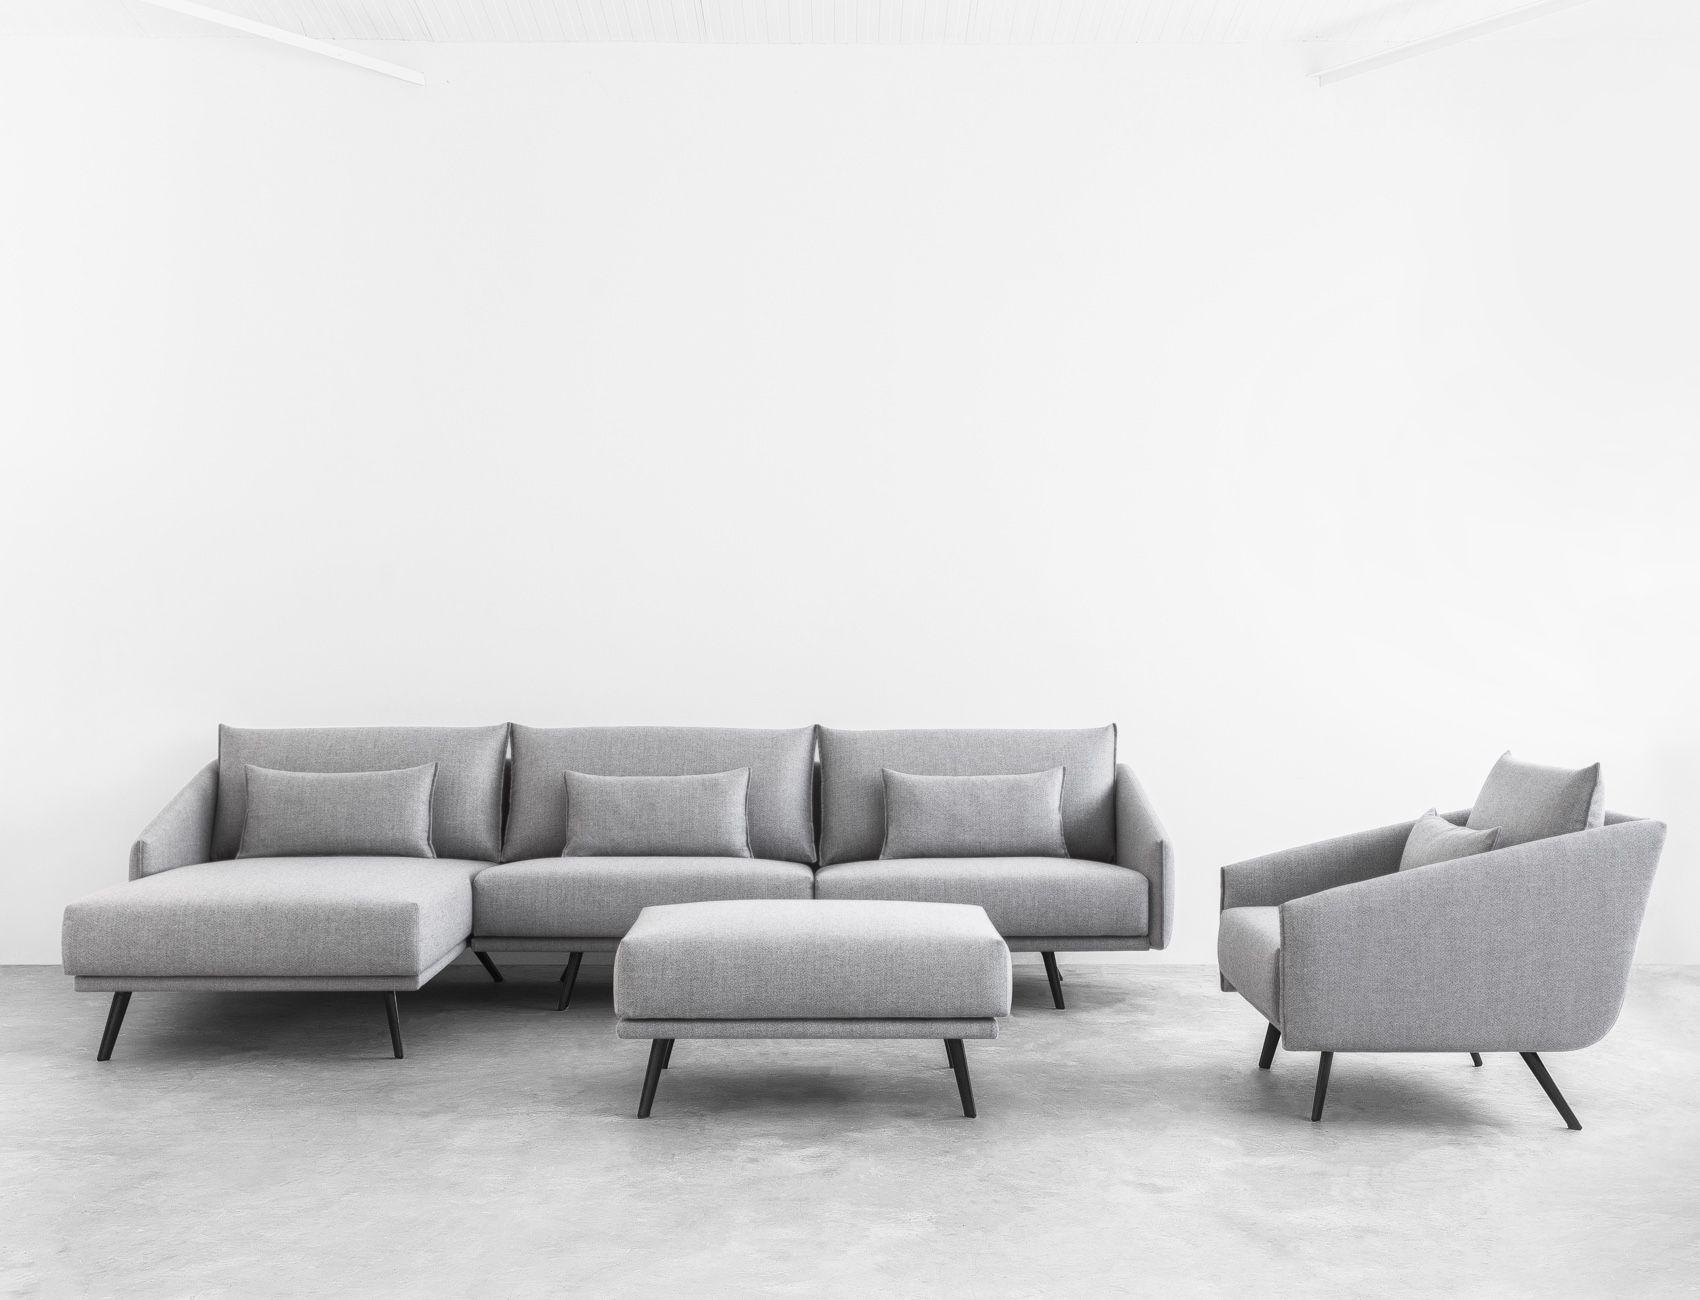 STUA Costura Sofa Chaise Longue with a Costura arm chair